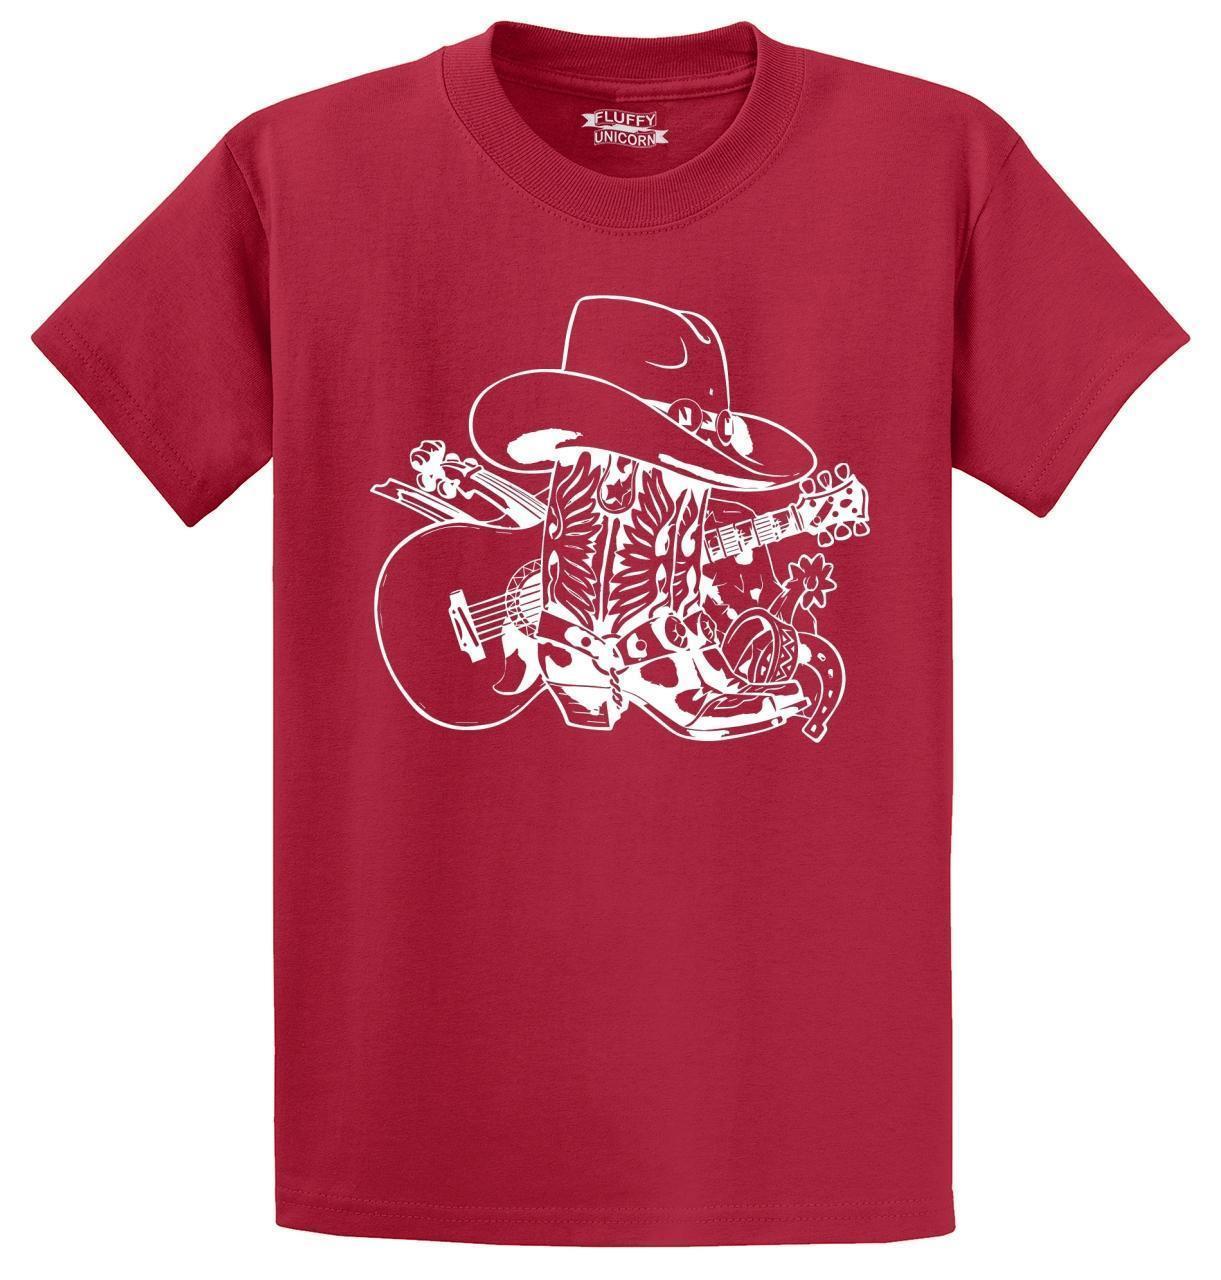 fee92b55b90 Compre Botas De Vaquero Para Hombre Sombrero De Vaquero Guitarra Gráfico De  Música Country Camiseta Hombres Mujeres Unisex Camiseta De Moda Envío  Gratis A ...